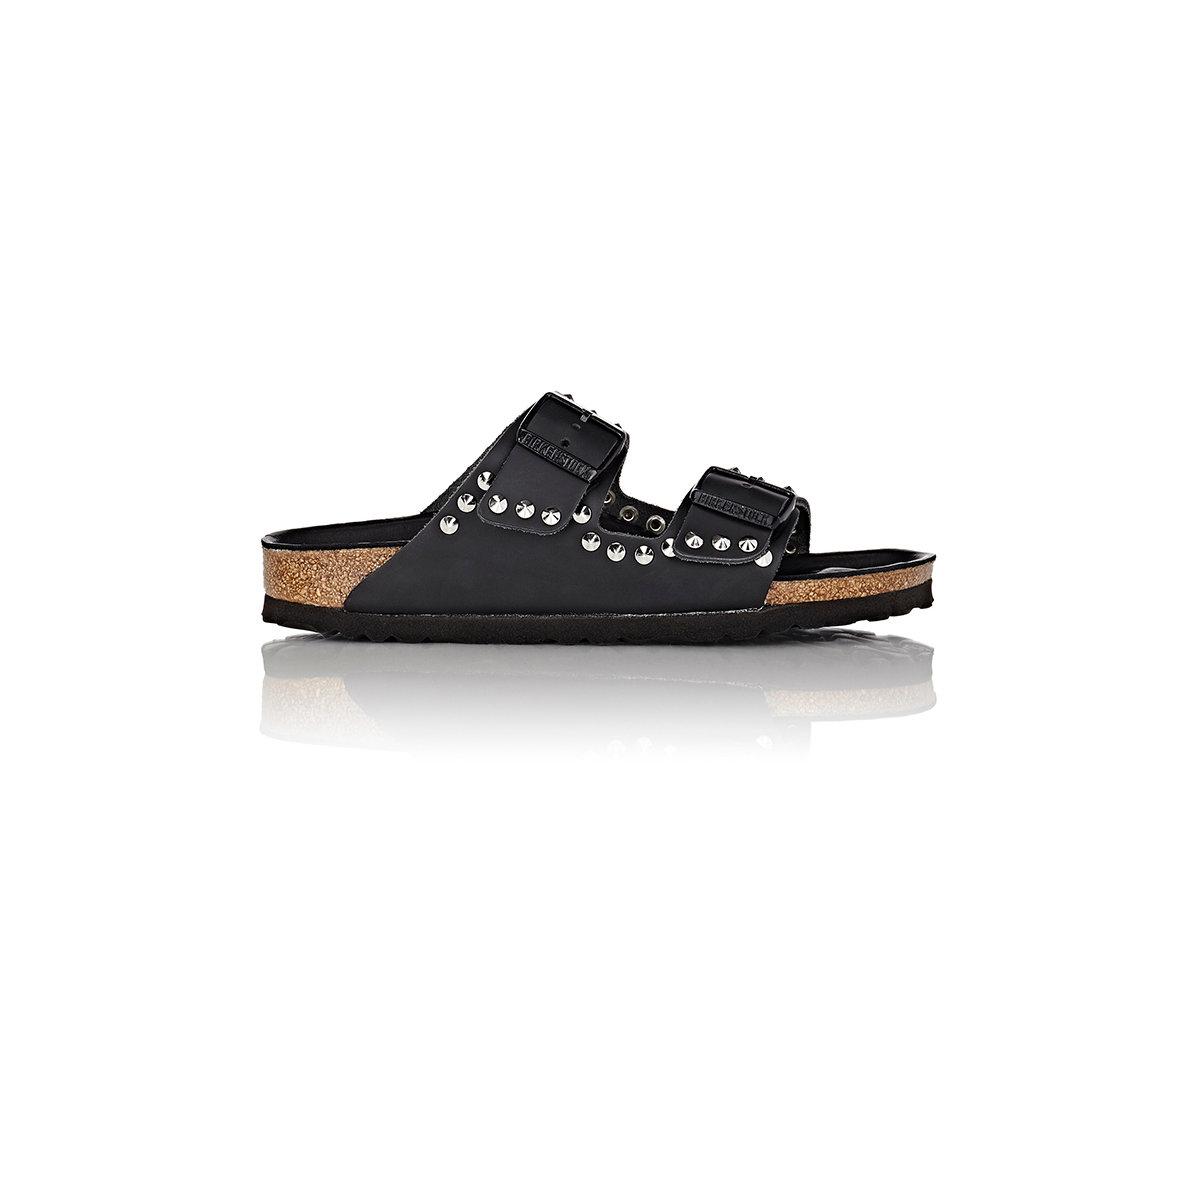 55183bfb43f4 Lyst - Birkenstock Women s Studded Arizona Double Buckle Sandals in ...